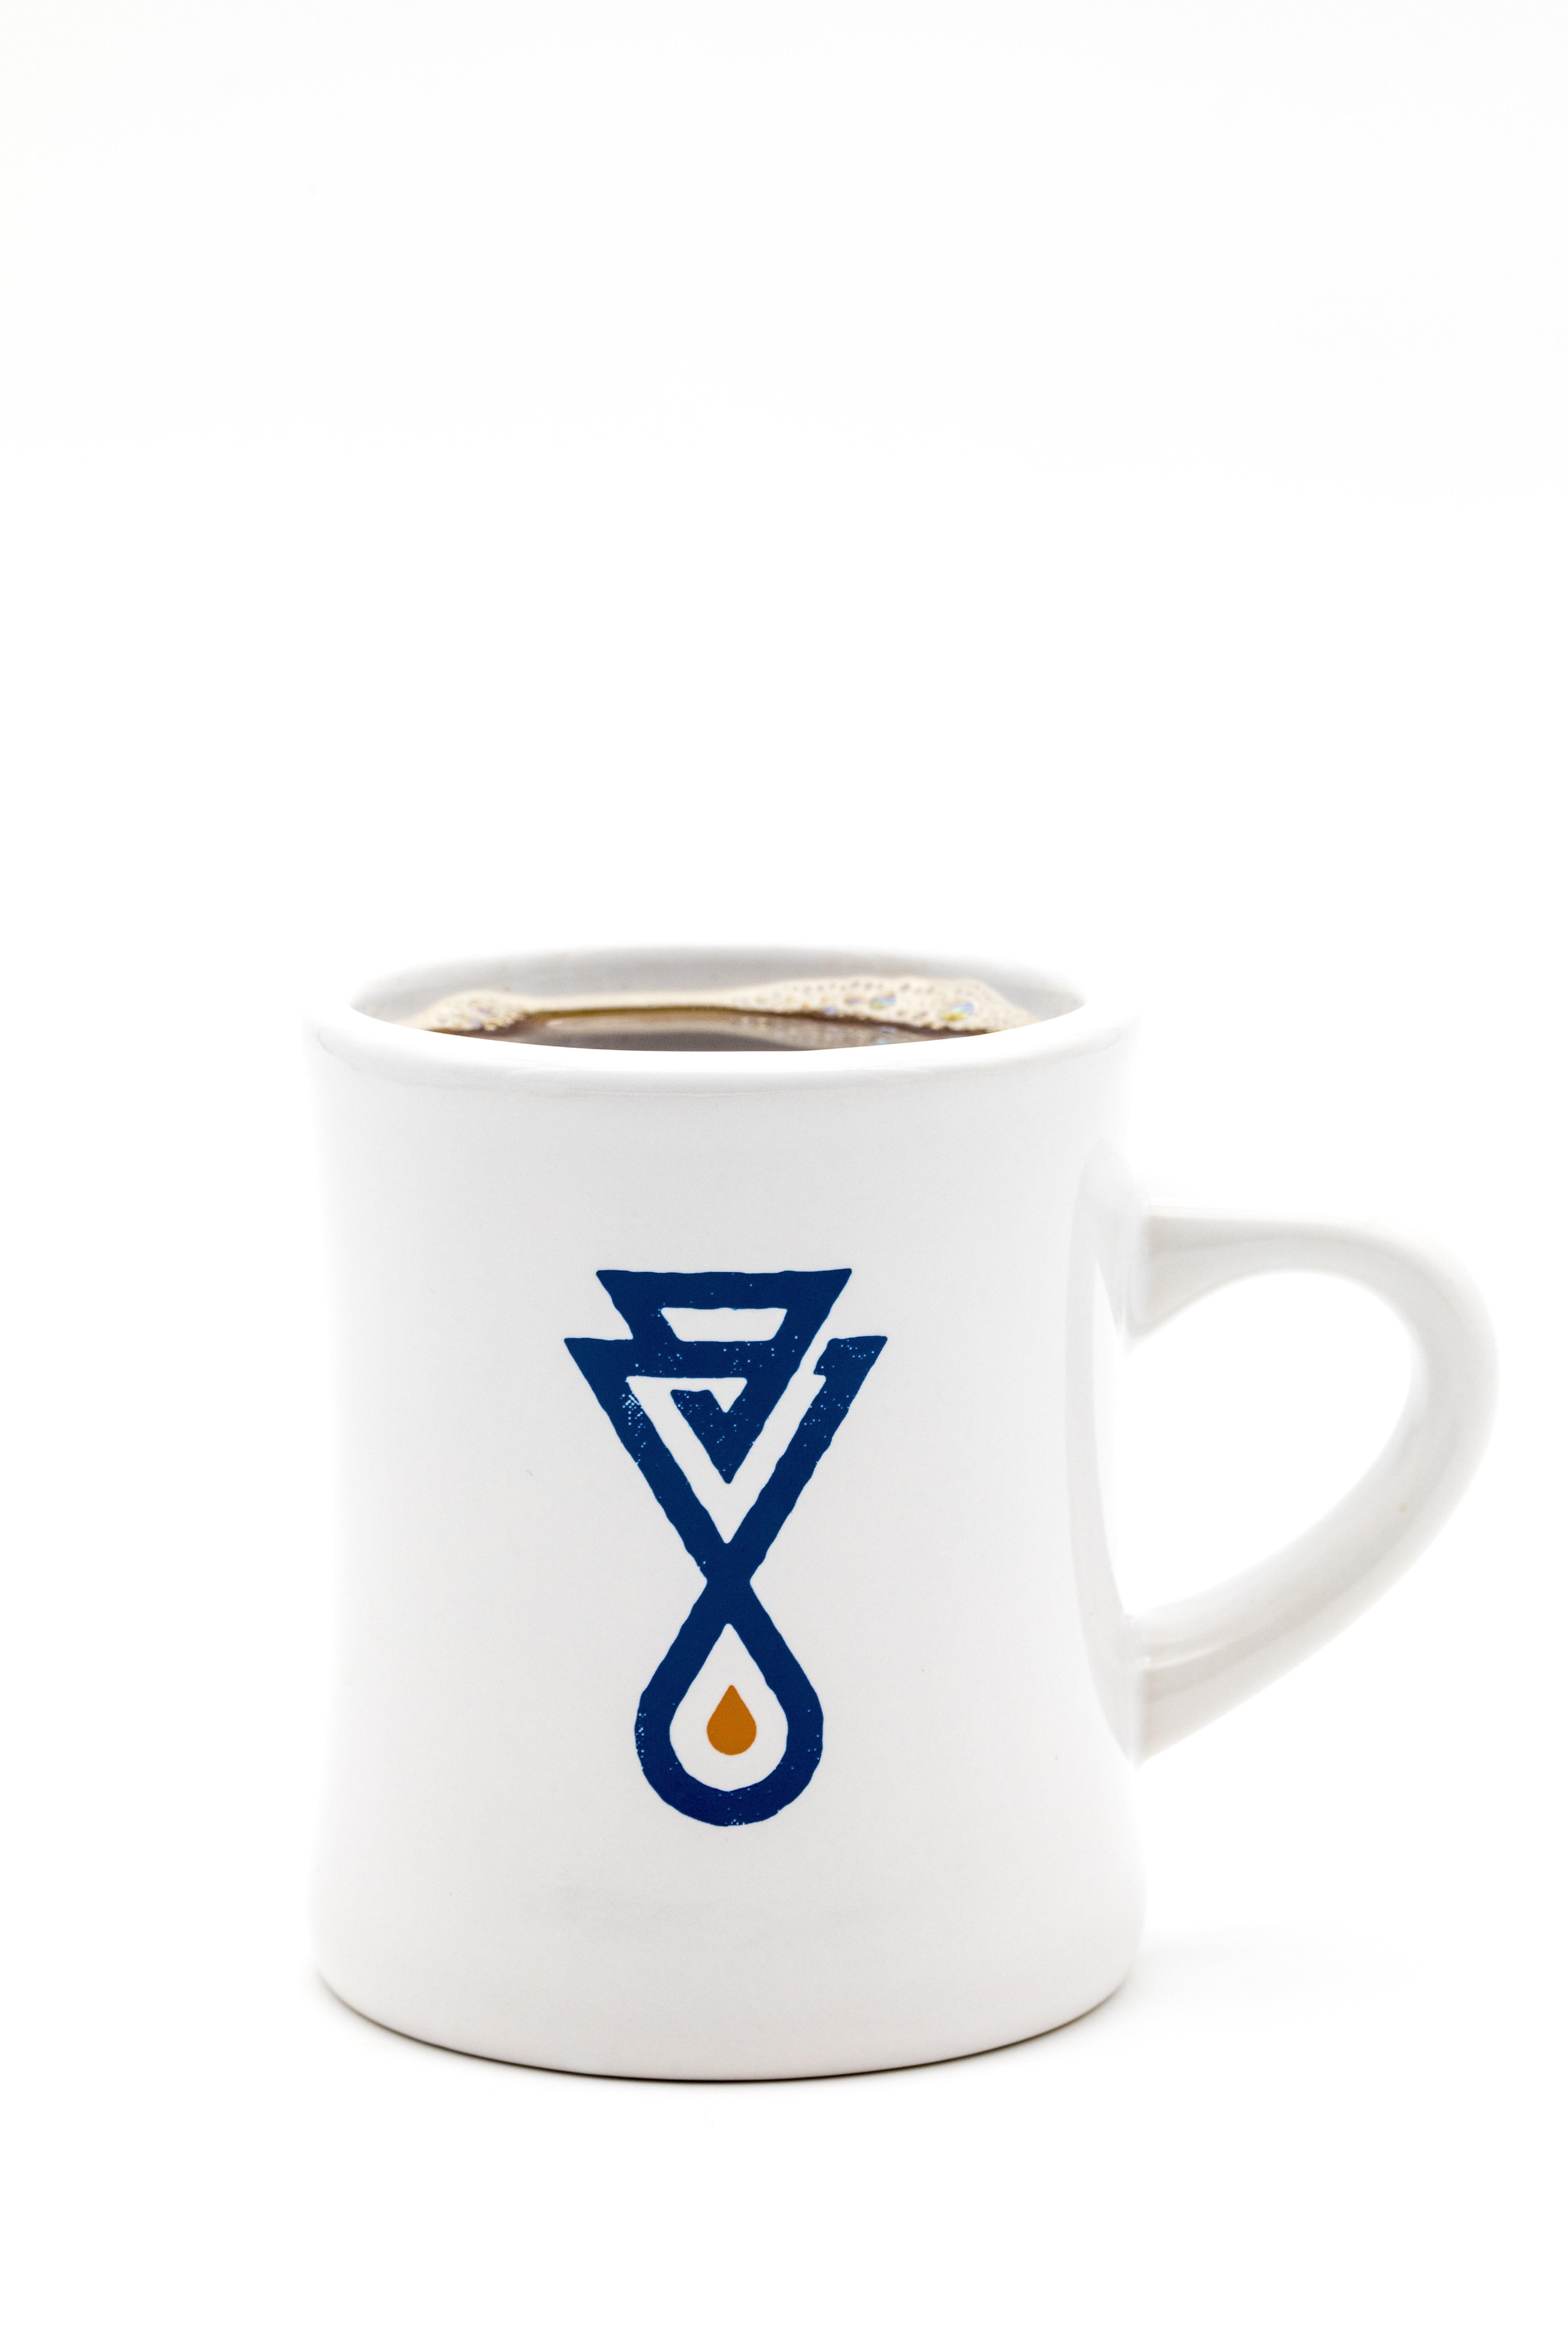 VVC Cafe Style Coffee Mug 00018